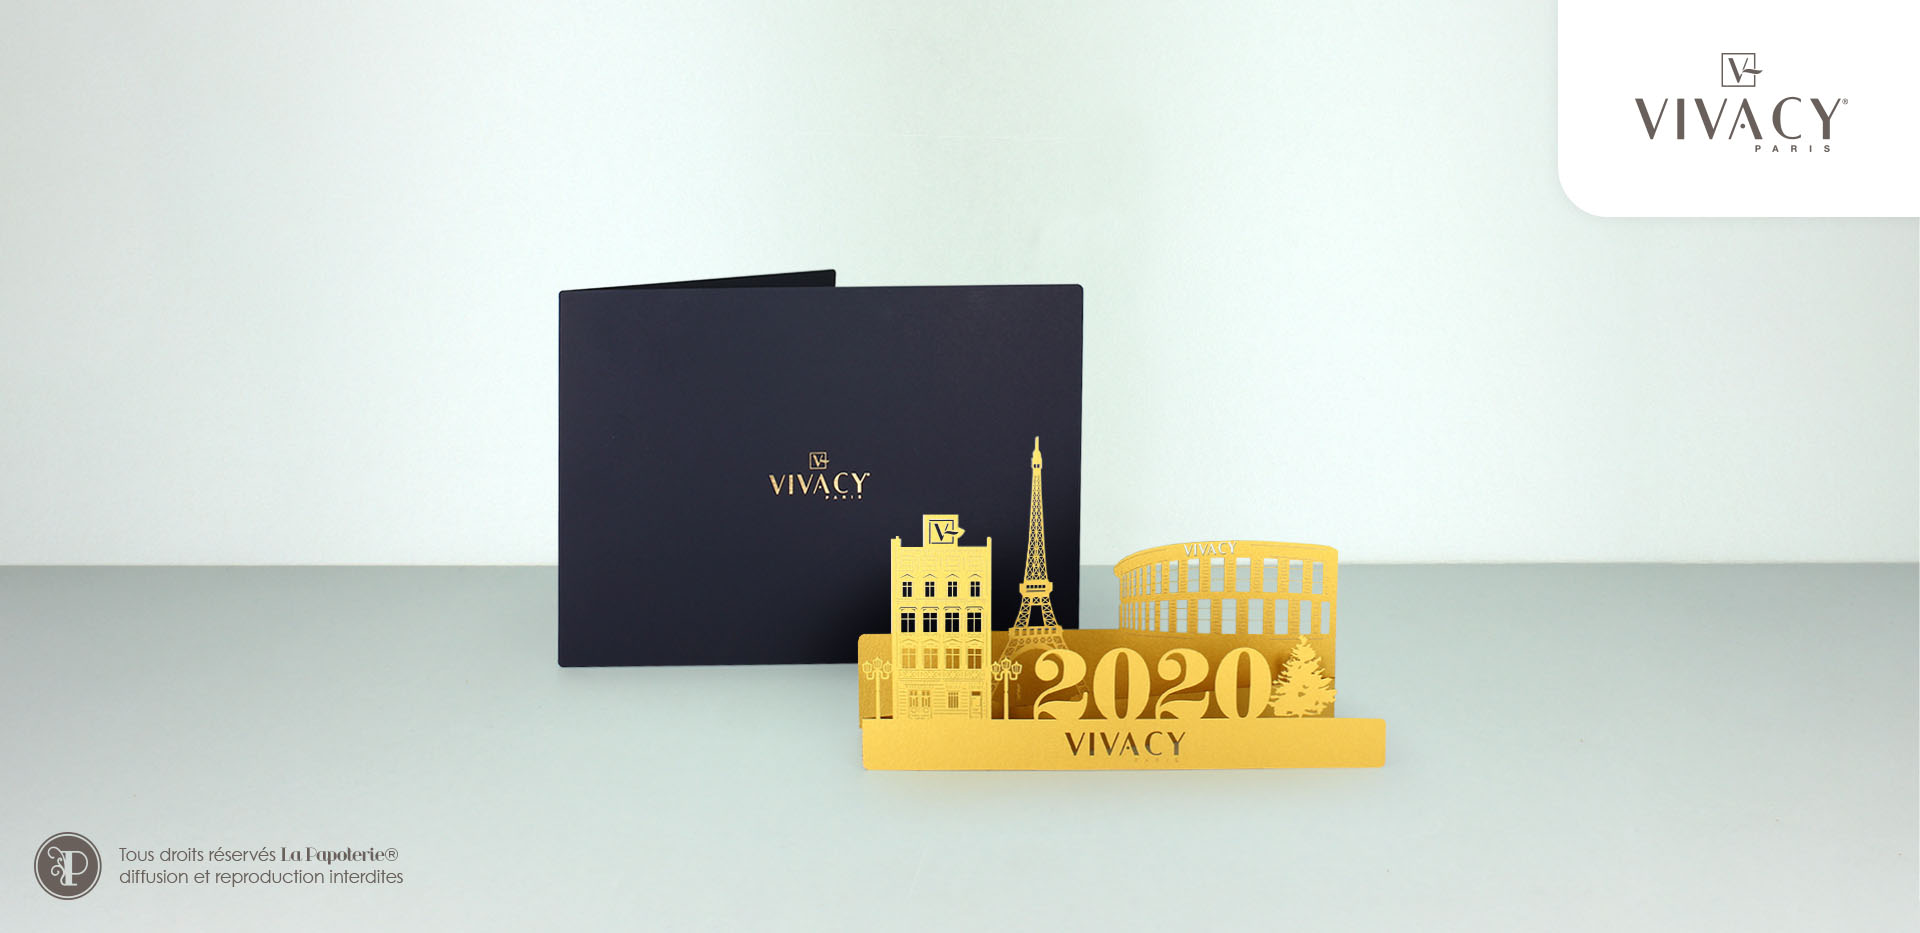 La Papoterie vivacy-laboratoire-panorama-carte-voeux-lapapoterie Greetings skyline cityscape card Vivacy